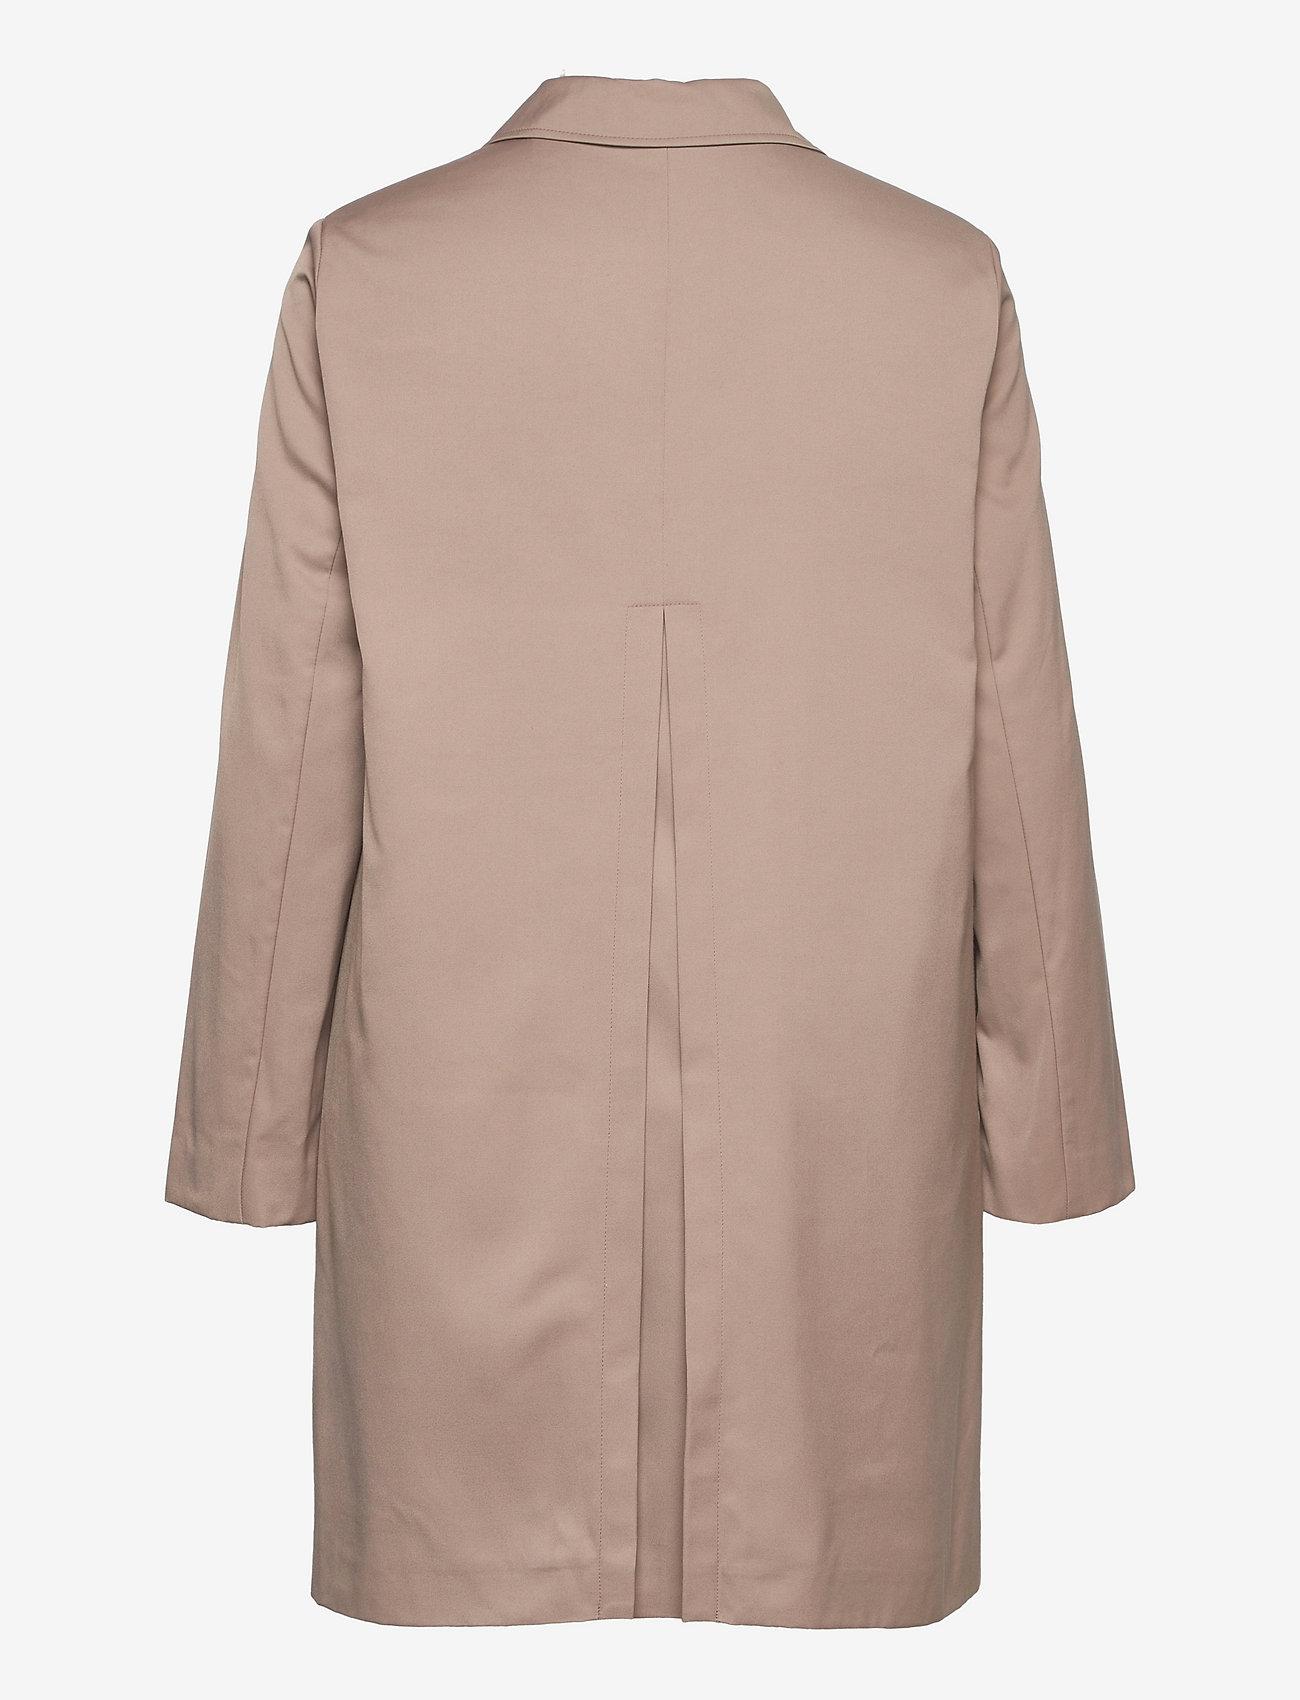 Max&Co. - ALISCAFO - trenchcoats - dove-grey - 1